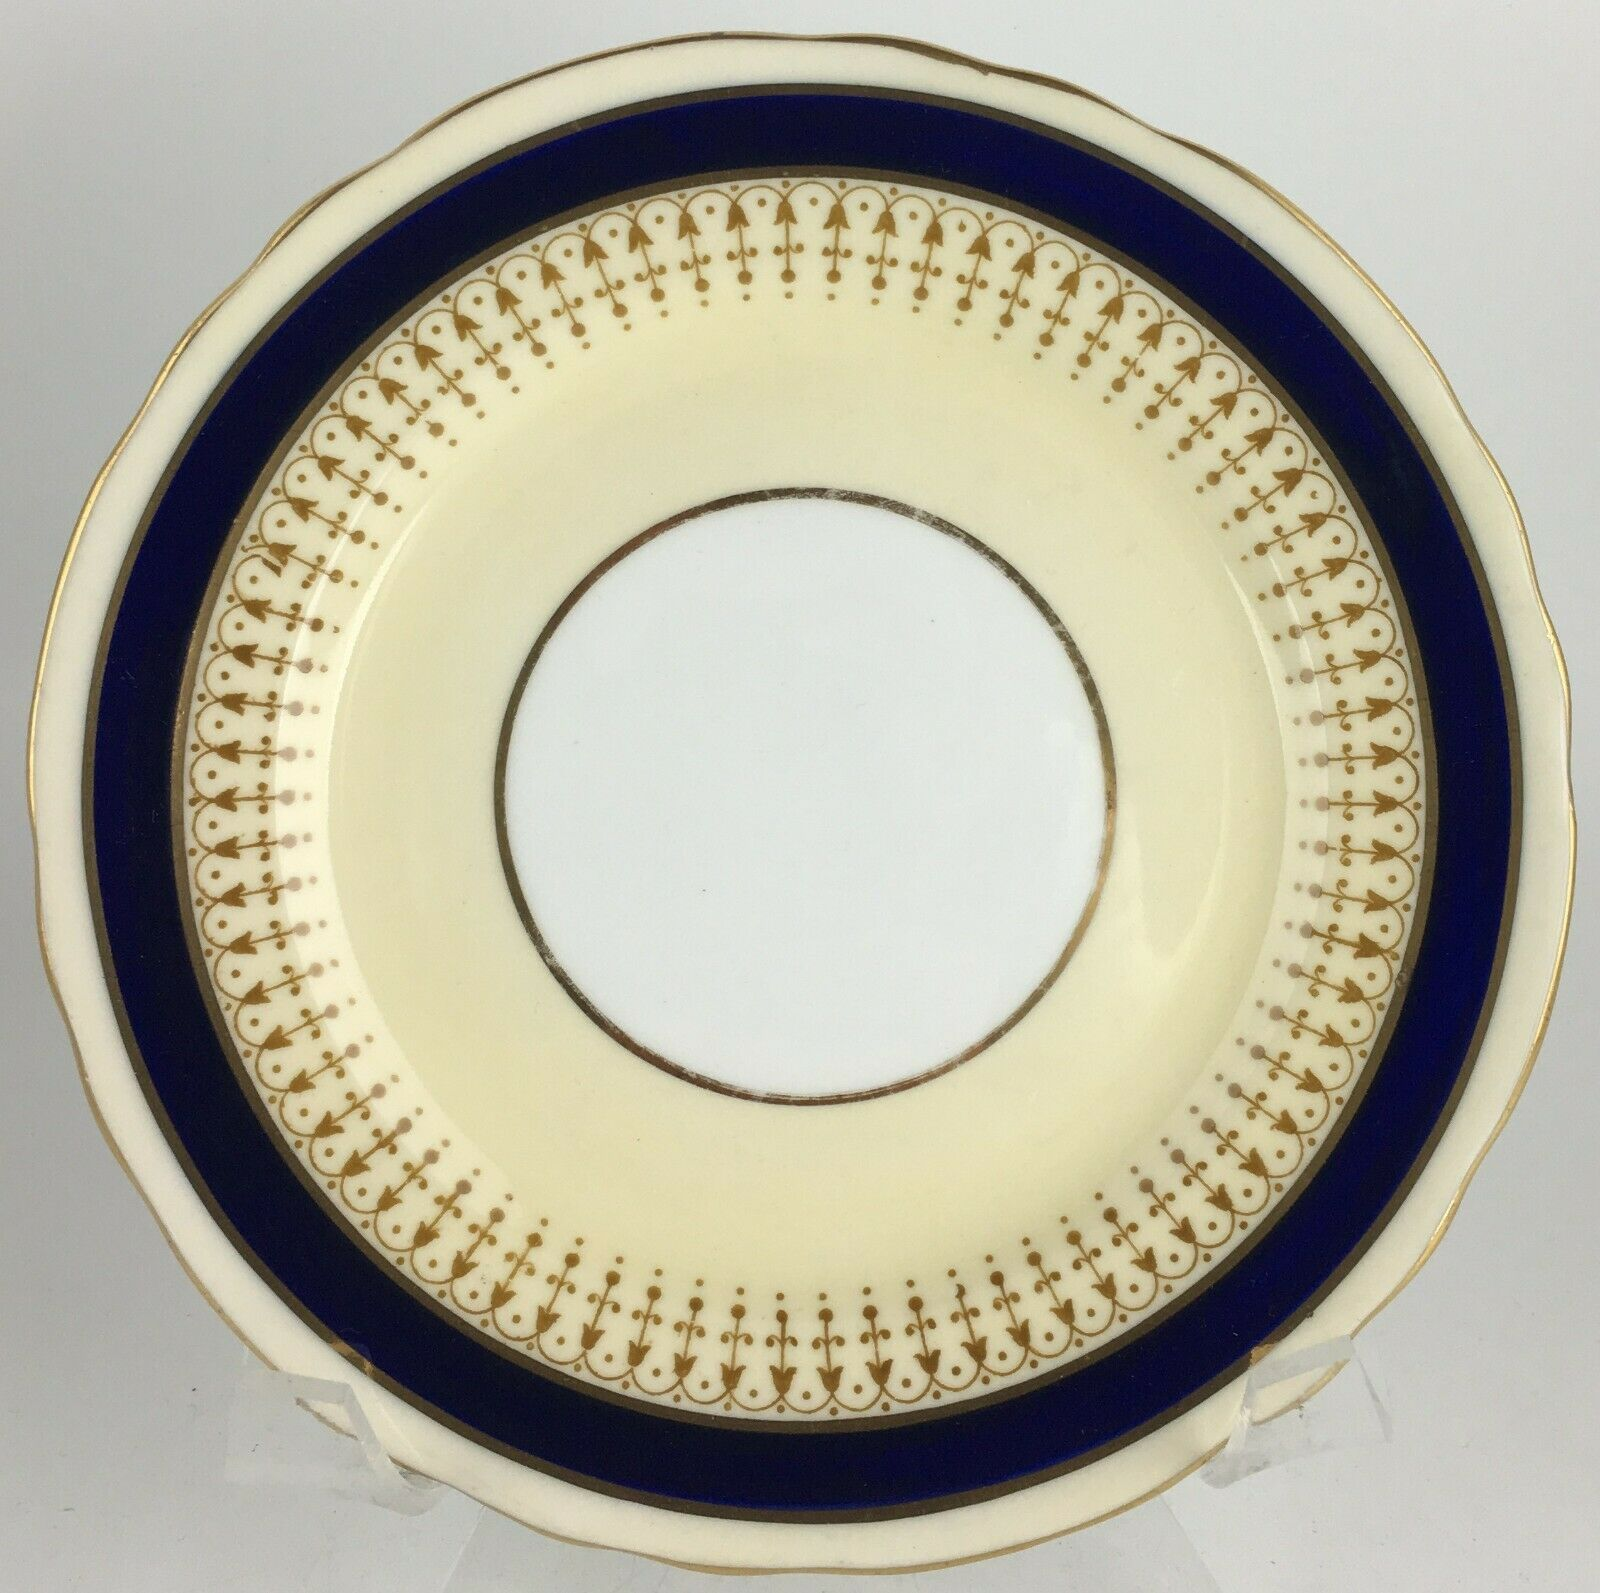 Aynsley 7301 Cobalt Bread & butter plate  - $8.00